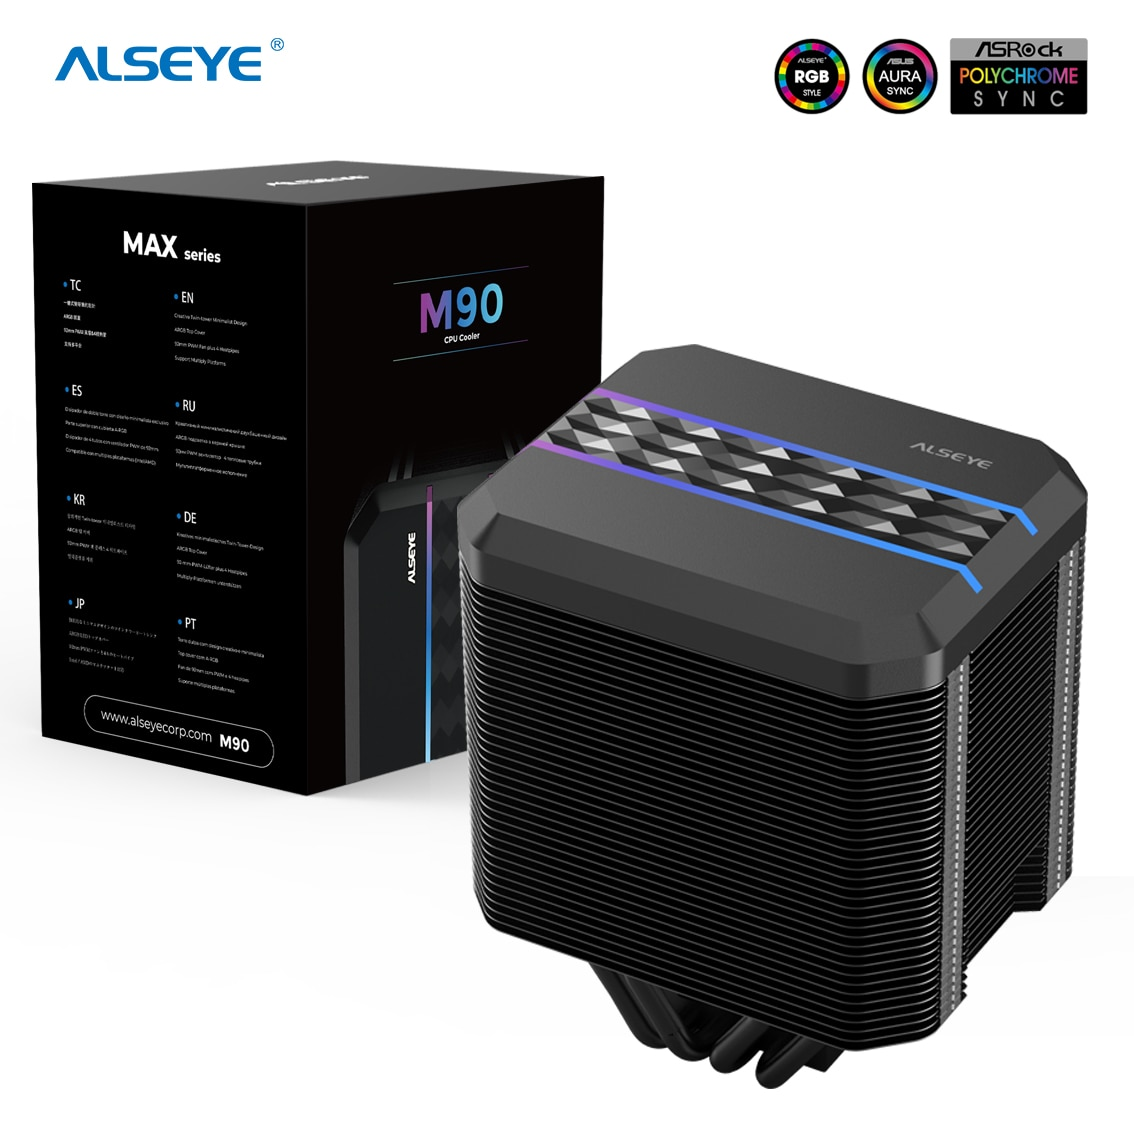 ALSEYE M90 CPU مروحة برودة PWM 90 مللي متر 4 دبوس 4 أنابيب الحرارة برودة دعم X99 اللوحة ل LGA 775 115x1366 2011 AM2 + AM3 + AM4